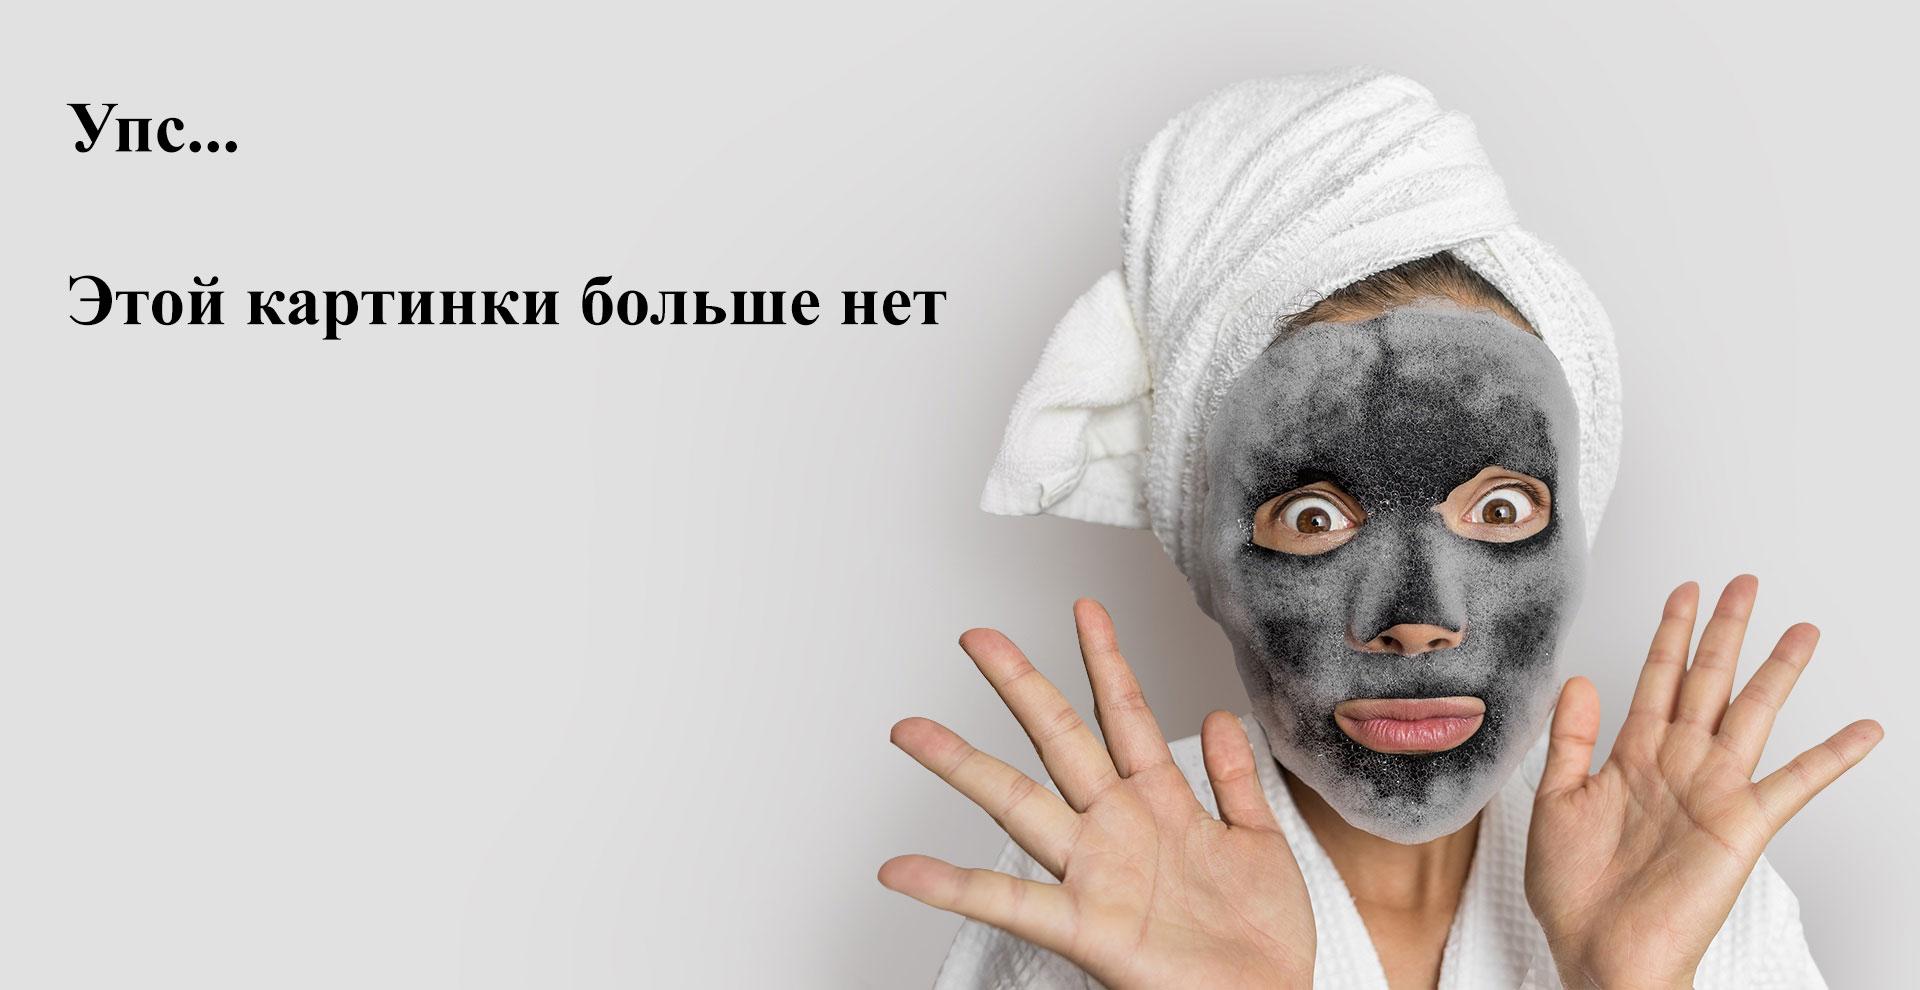 Patrisa Nail, Гель-лак Московская сага №753